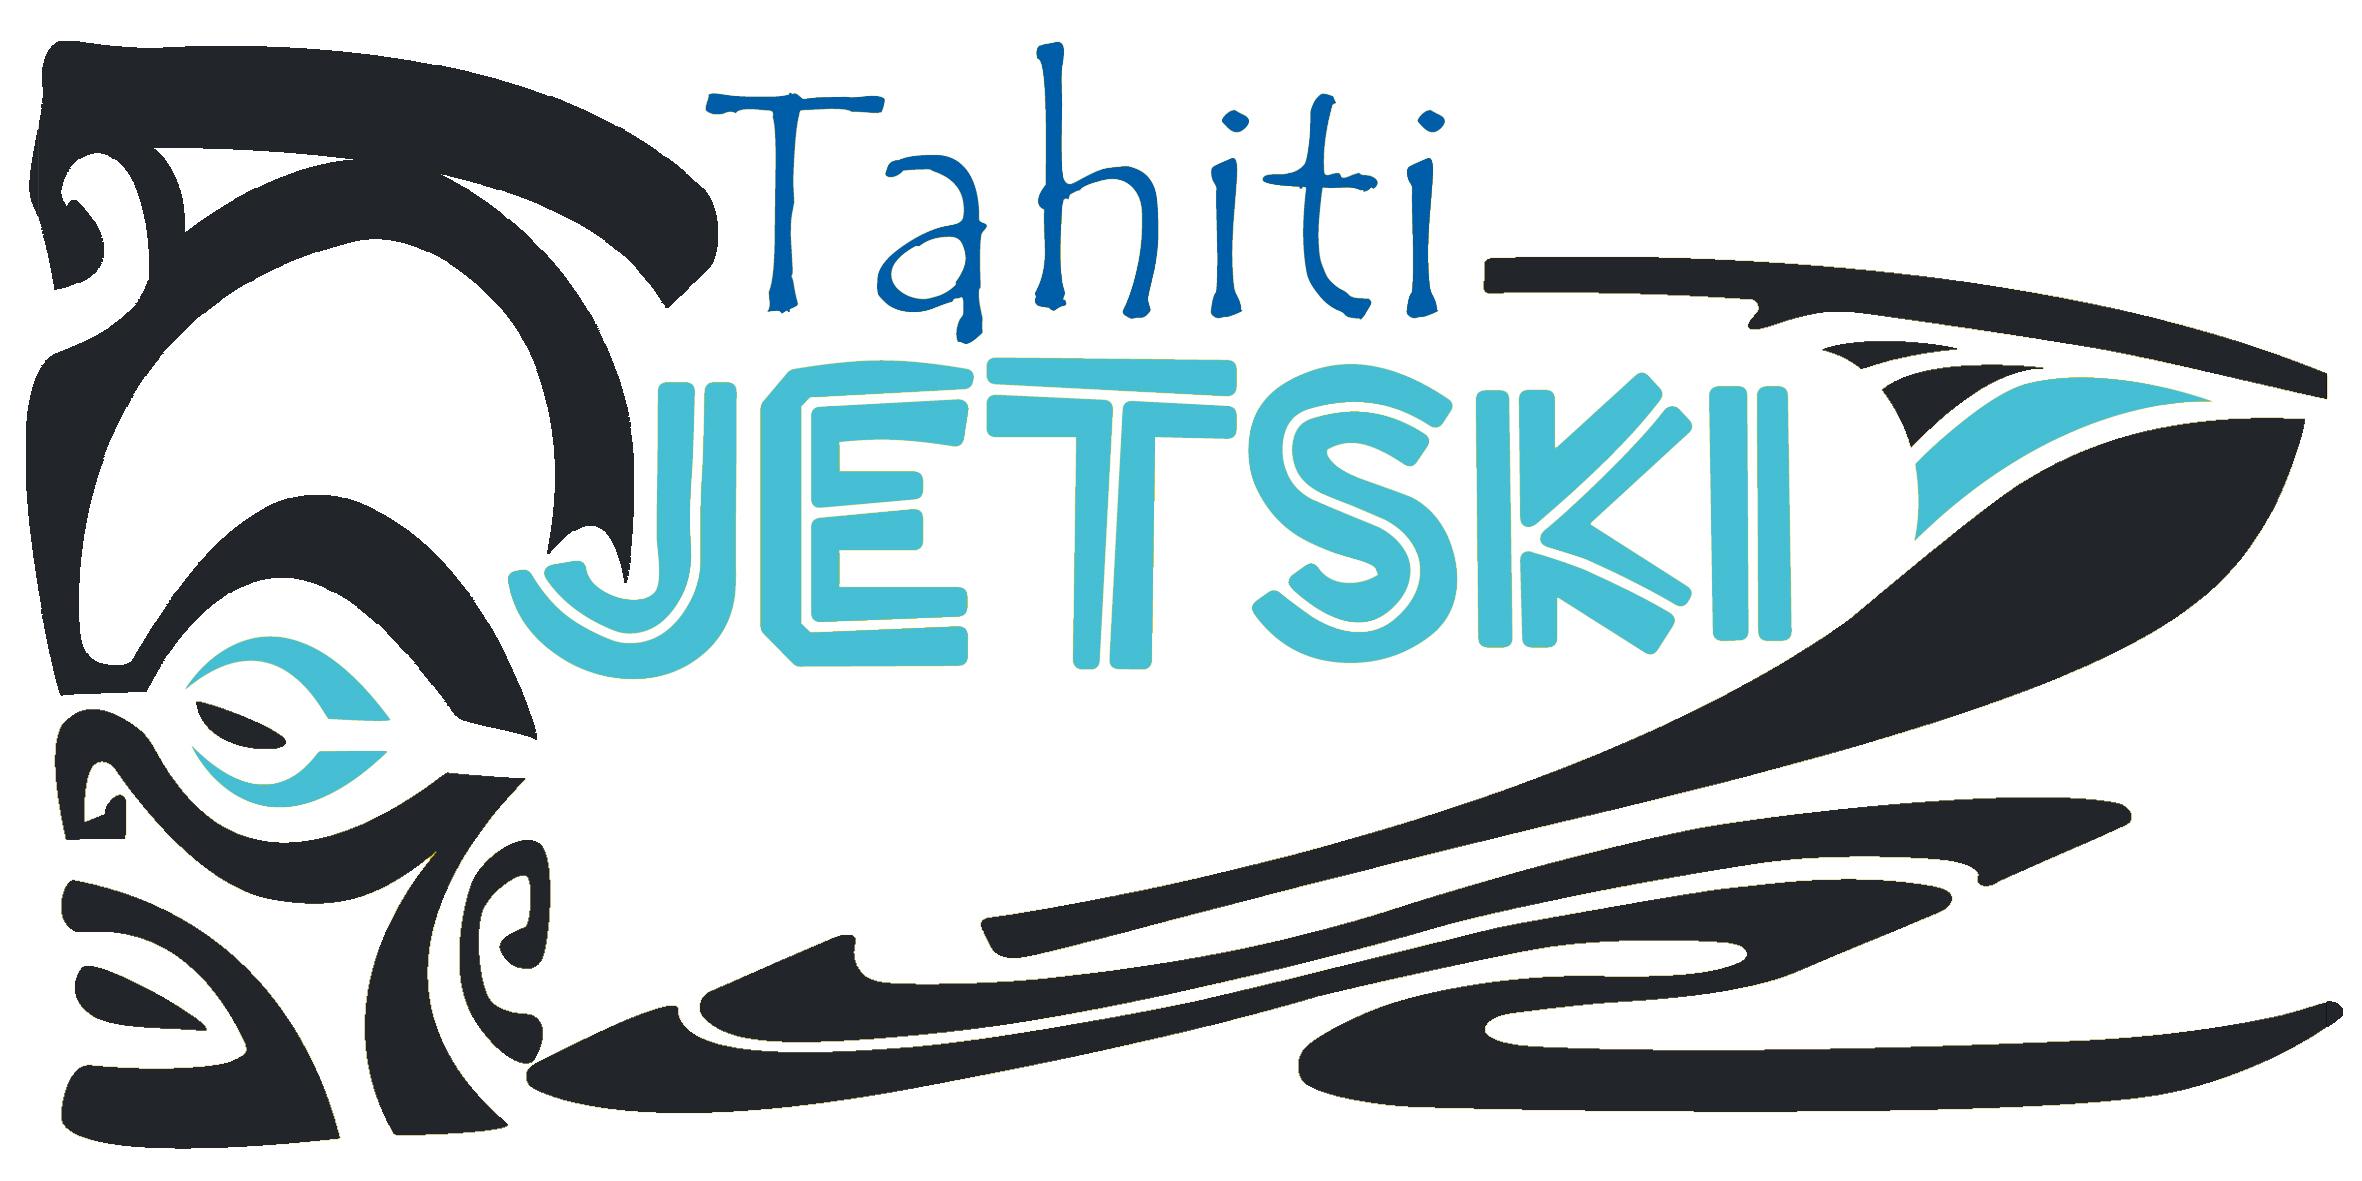 https://tahititourisme.nz/wp-content/uploads/2017/08/logo-transfert.jpg